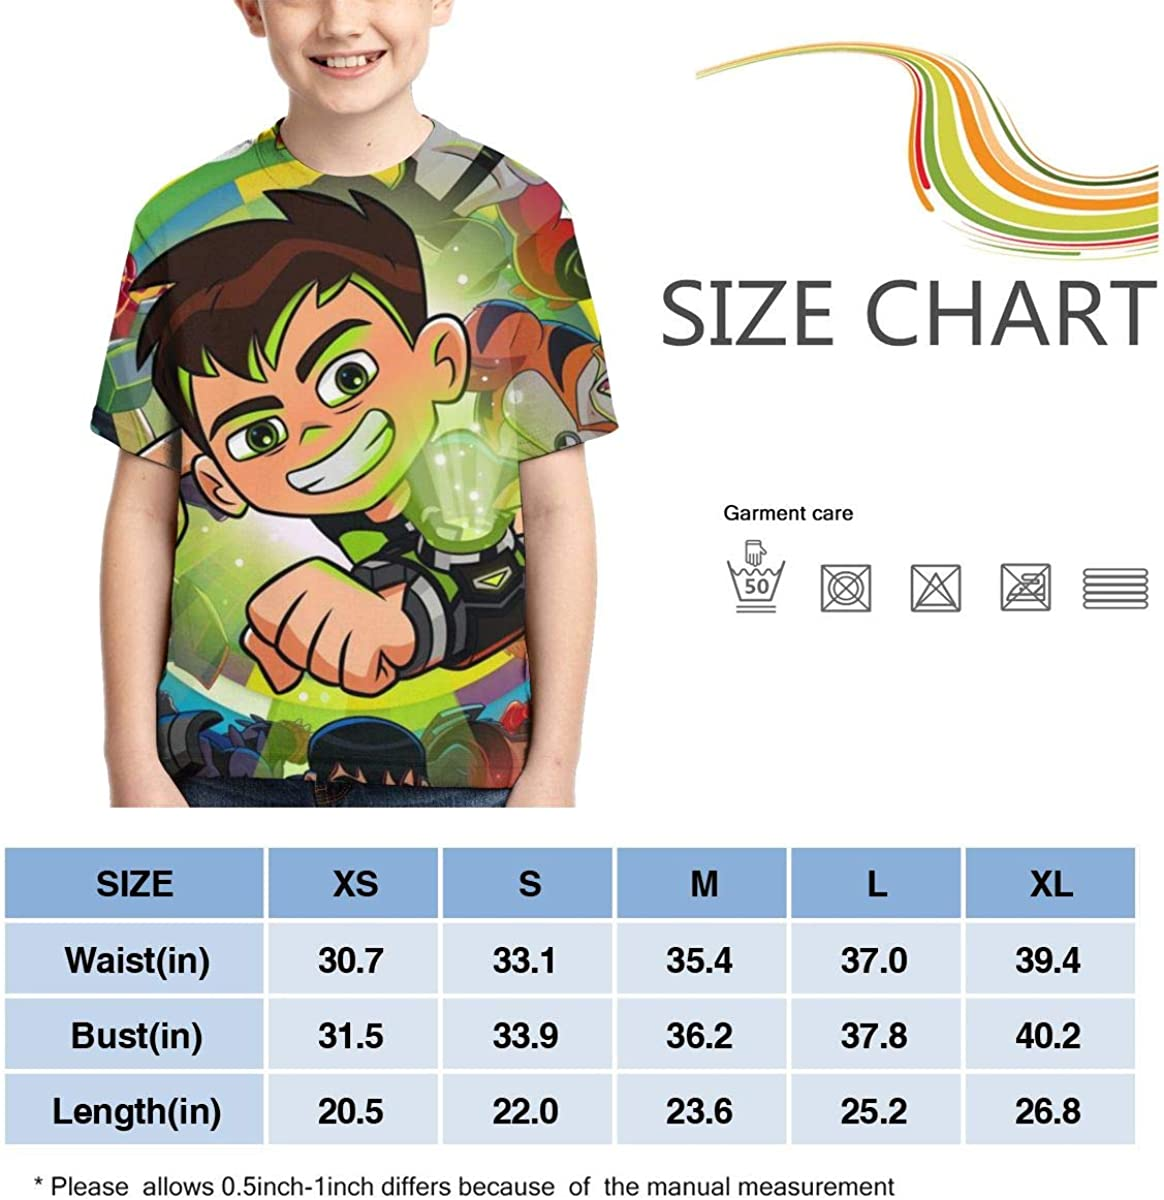 Hatstng Ben-10 and Alien Hero Boys Girls 3D Print Crew Tee Youth Short Sleeve T-Shirt Tanks Tops